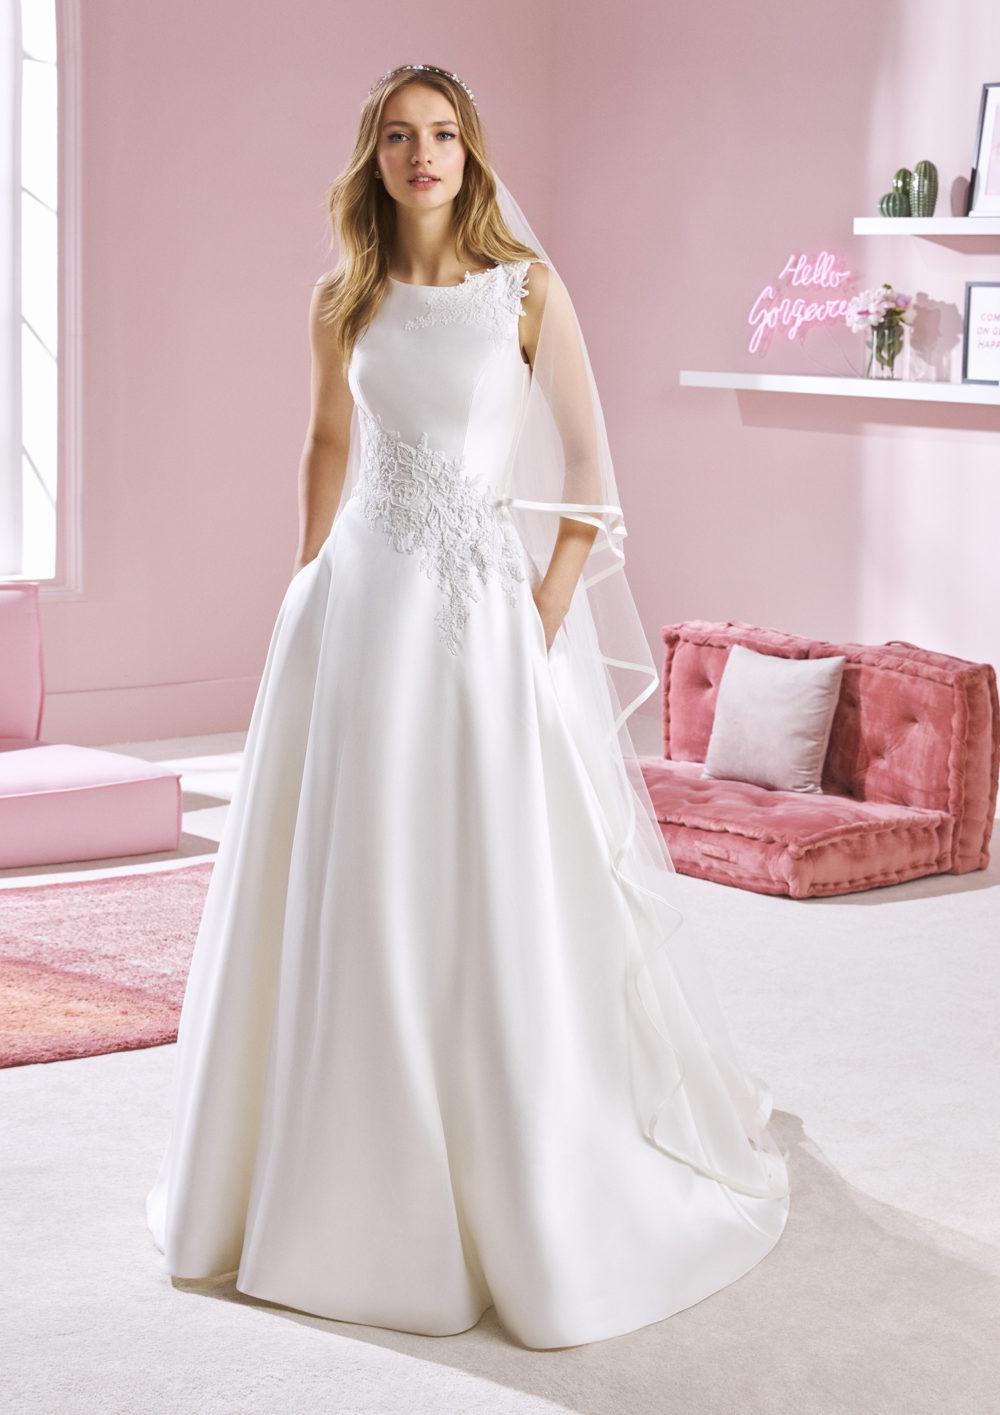 Mariages: abito da sposa Poème 2020 a Vicenza, Verona, Padova, Veneto WHITNEY